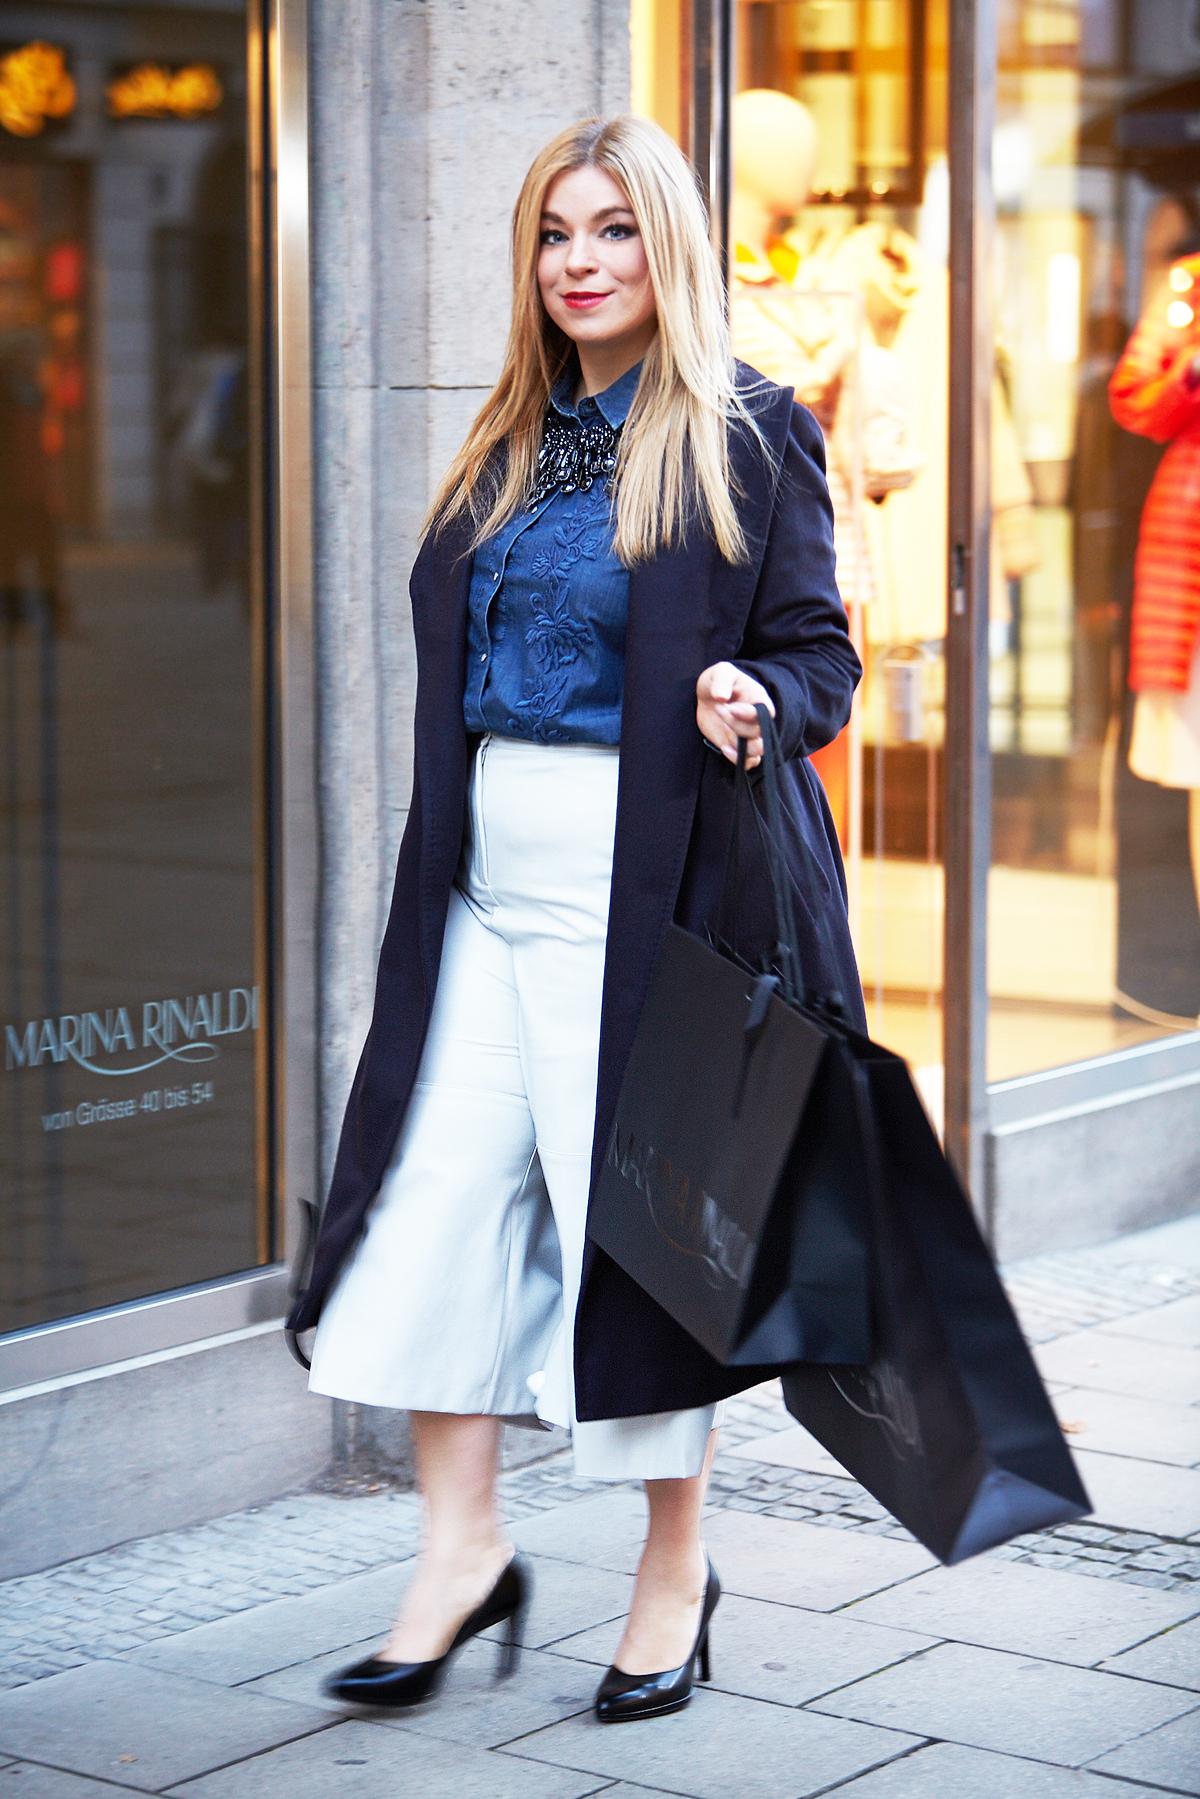 Marina-Rinaldi-Blogger-Megabambi-Caterina-pogorzelski-Blackfriday-PLusiszeblogger